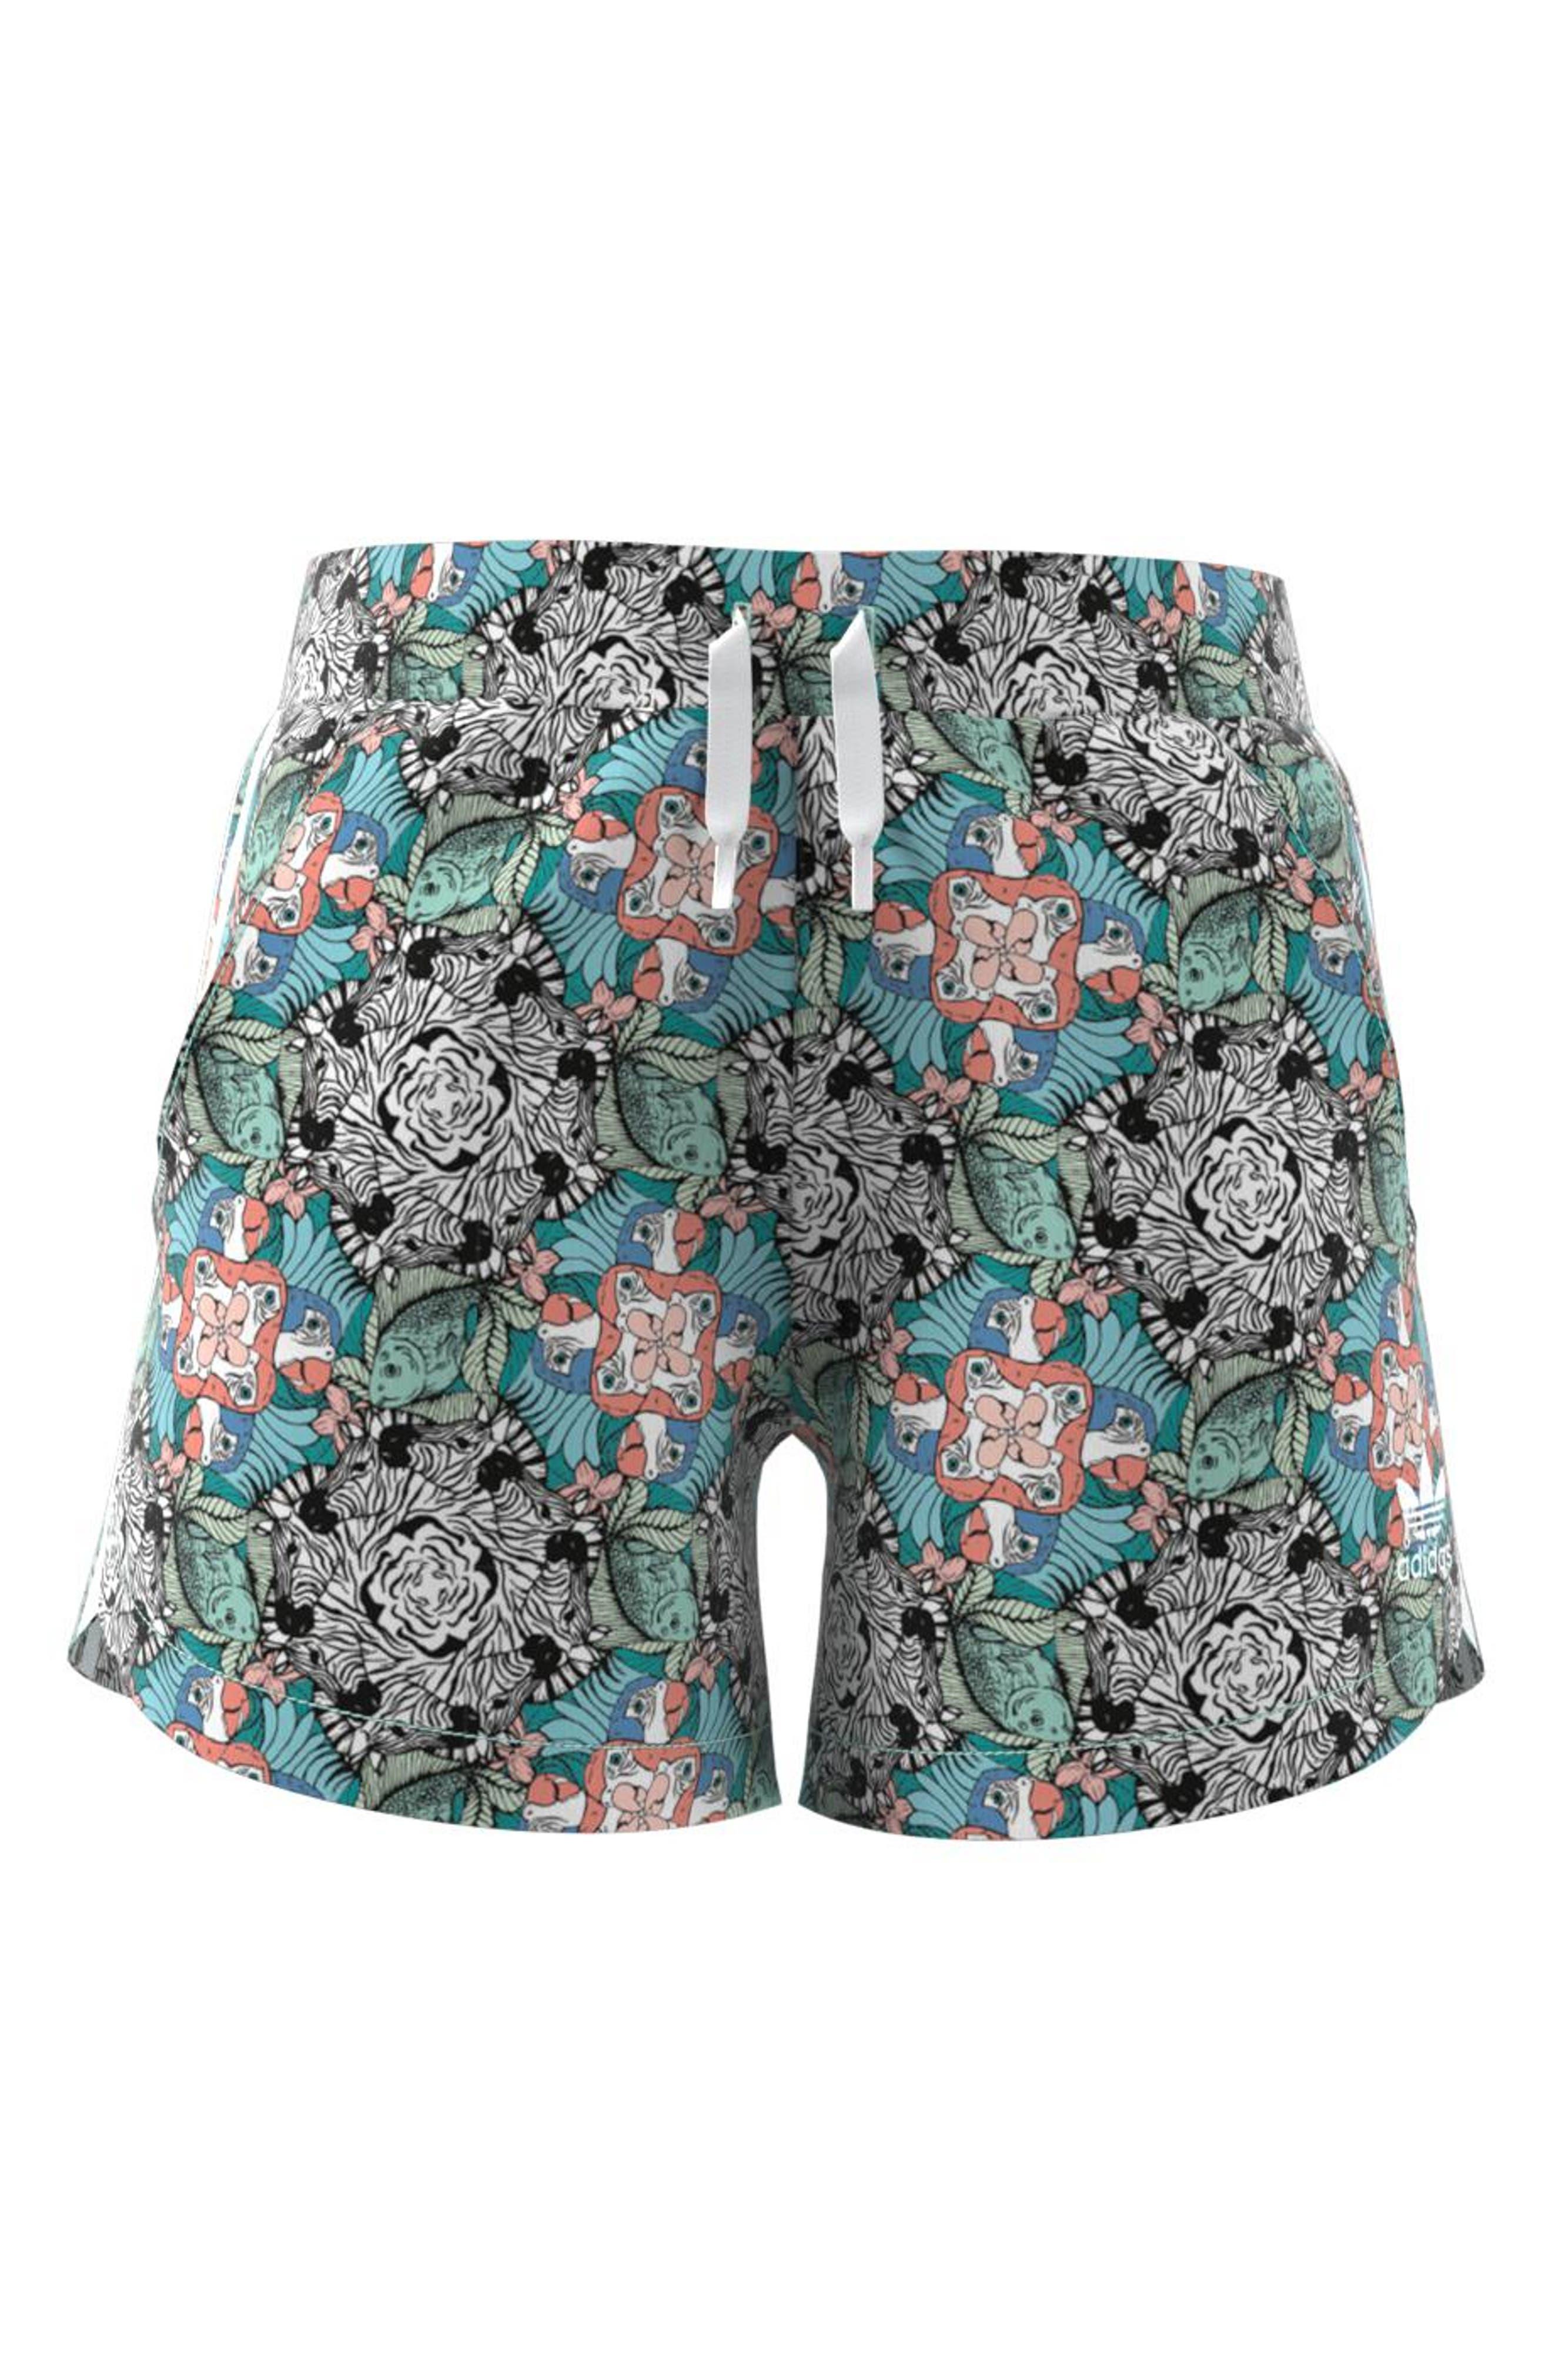 Zoo Shorts,                             Alternate thumbnail 5, color,                             MULTI-COLOR / WHITE